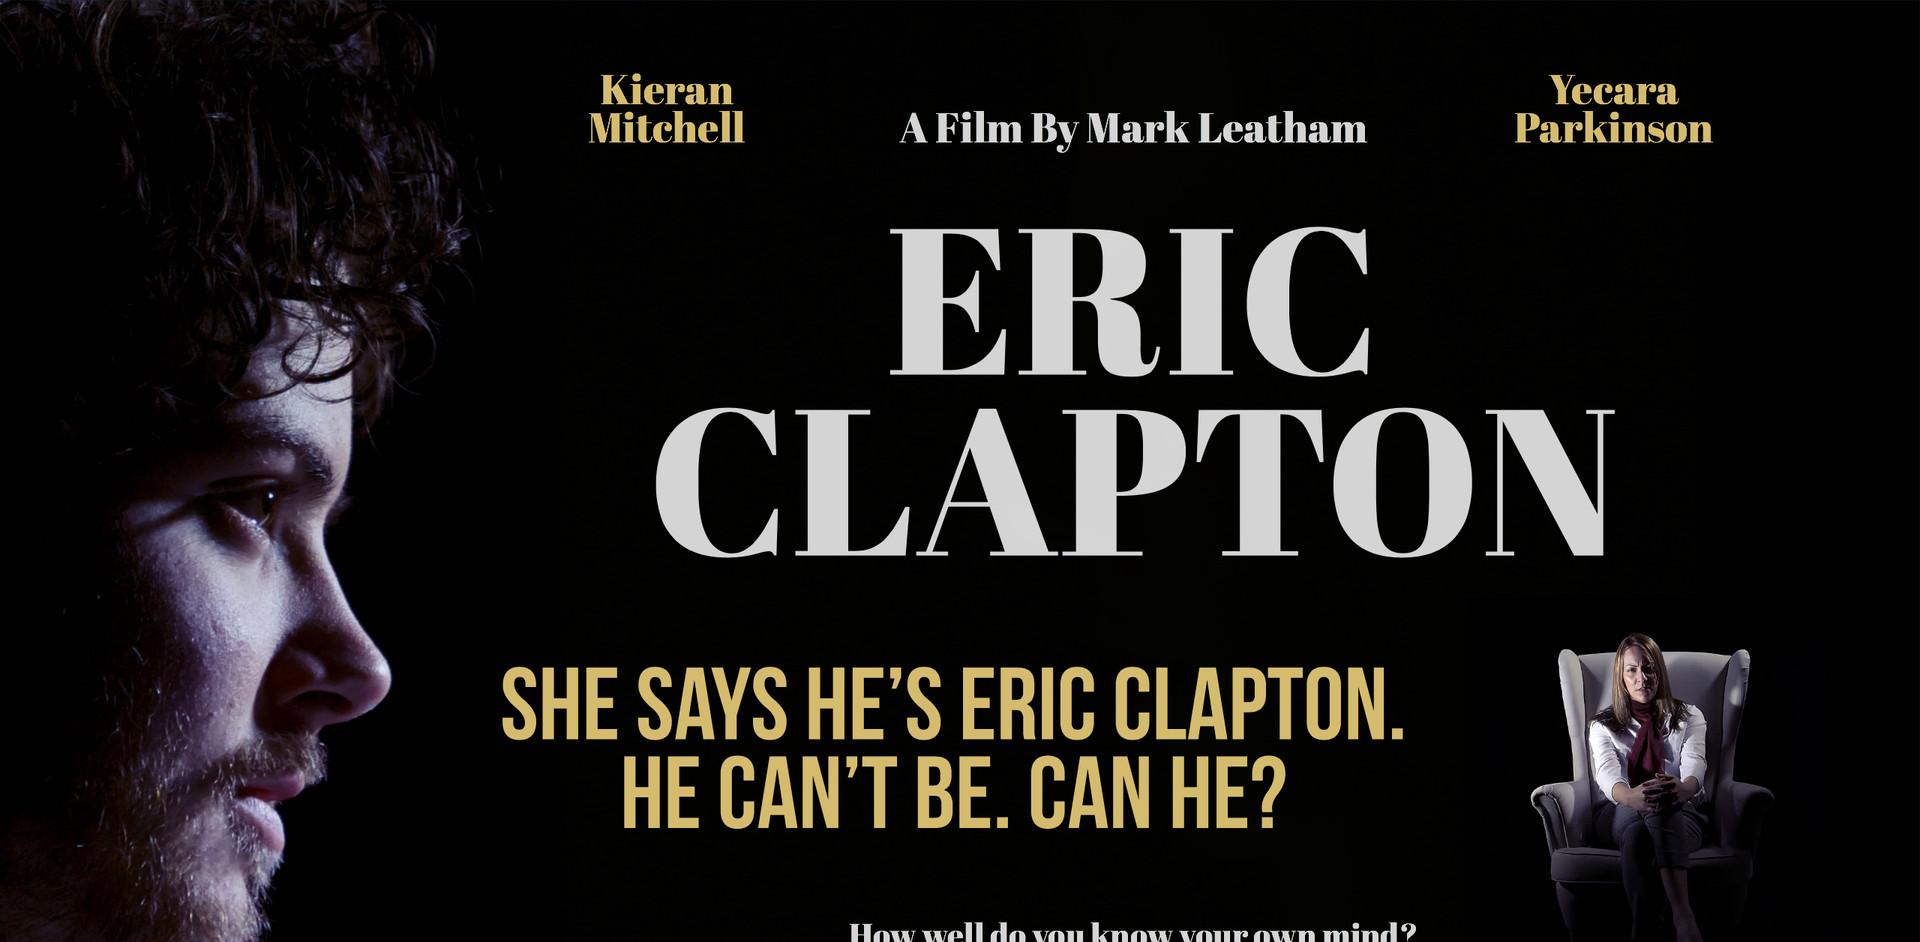 Eric Clapton Film Poster